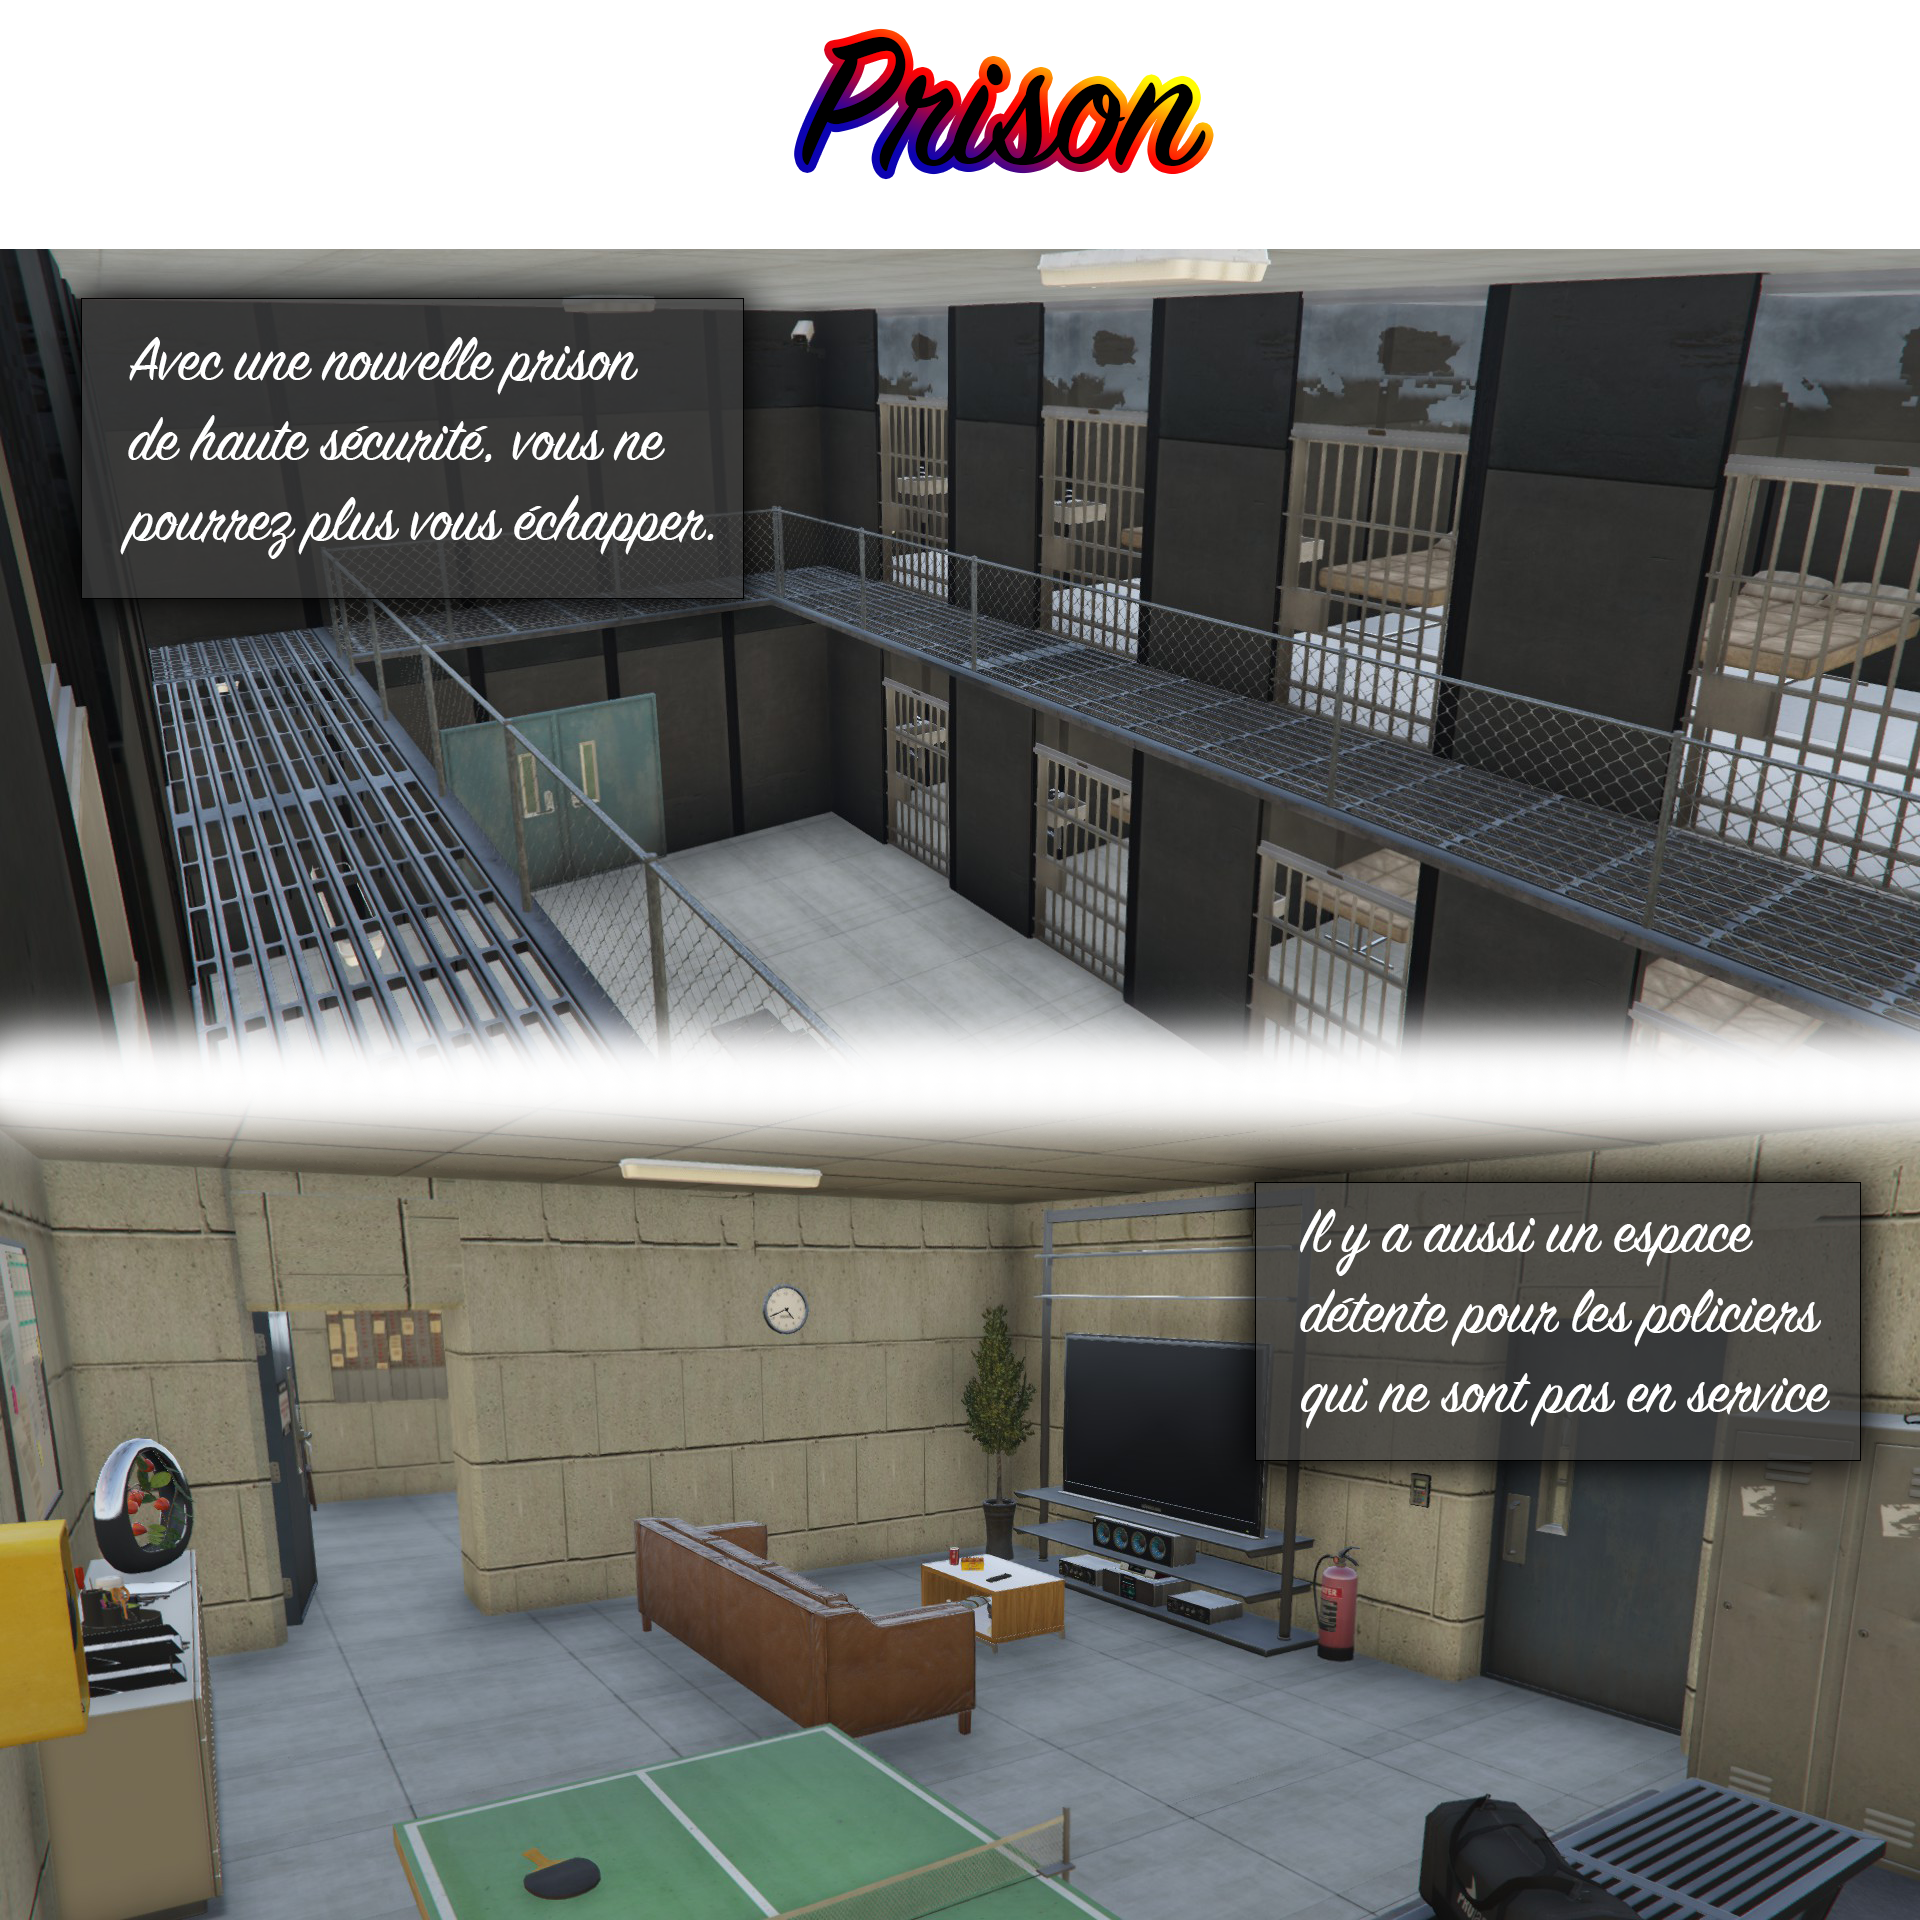 5adf4e5a8d0ba-Prison.png